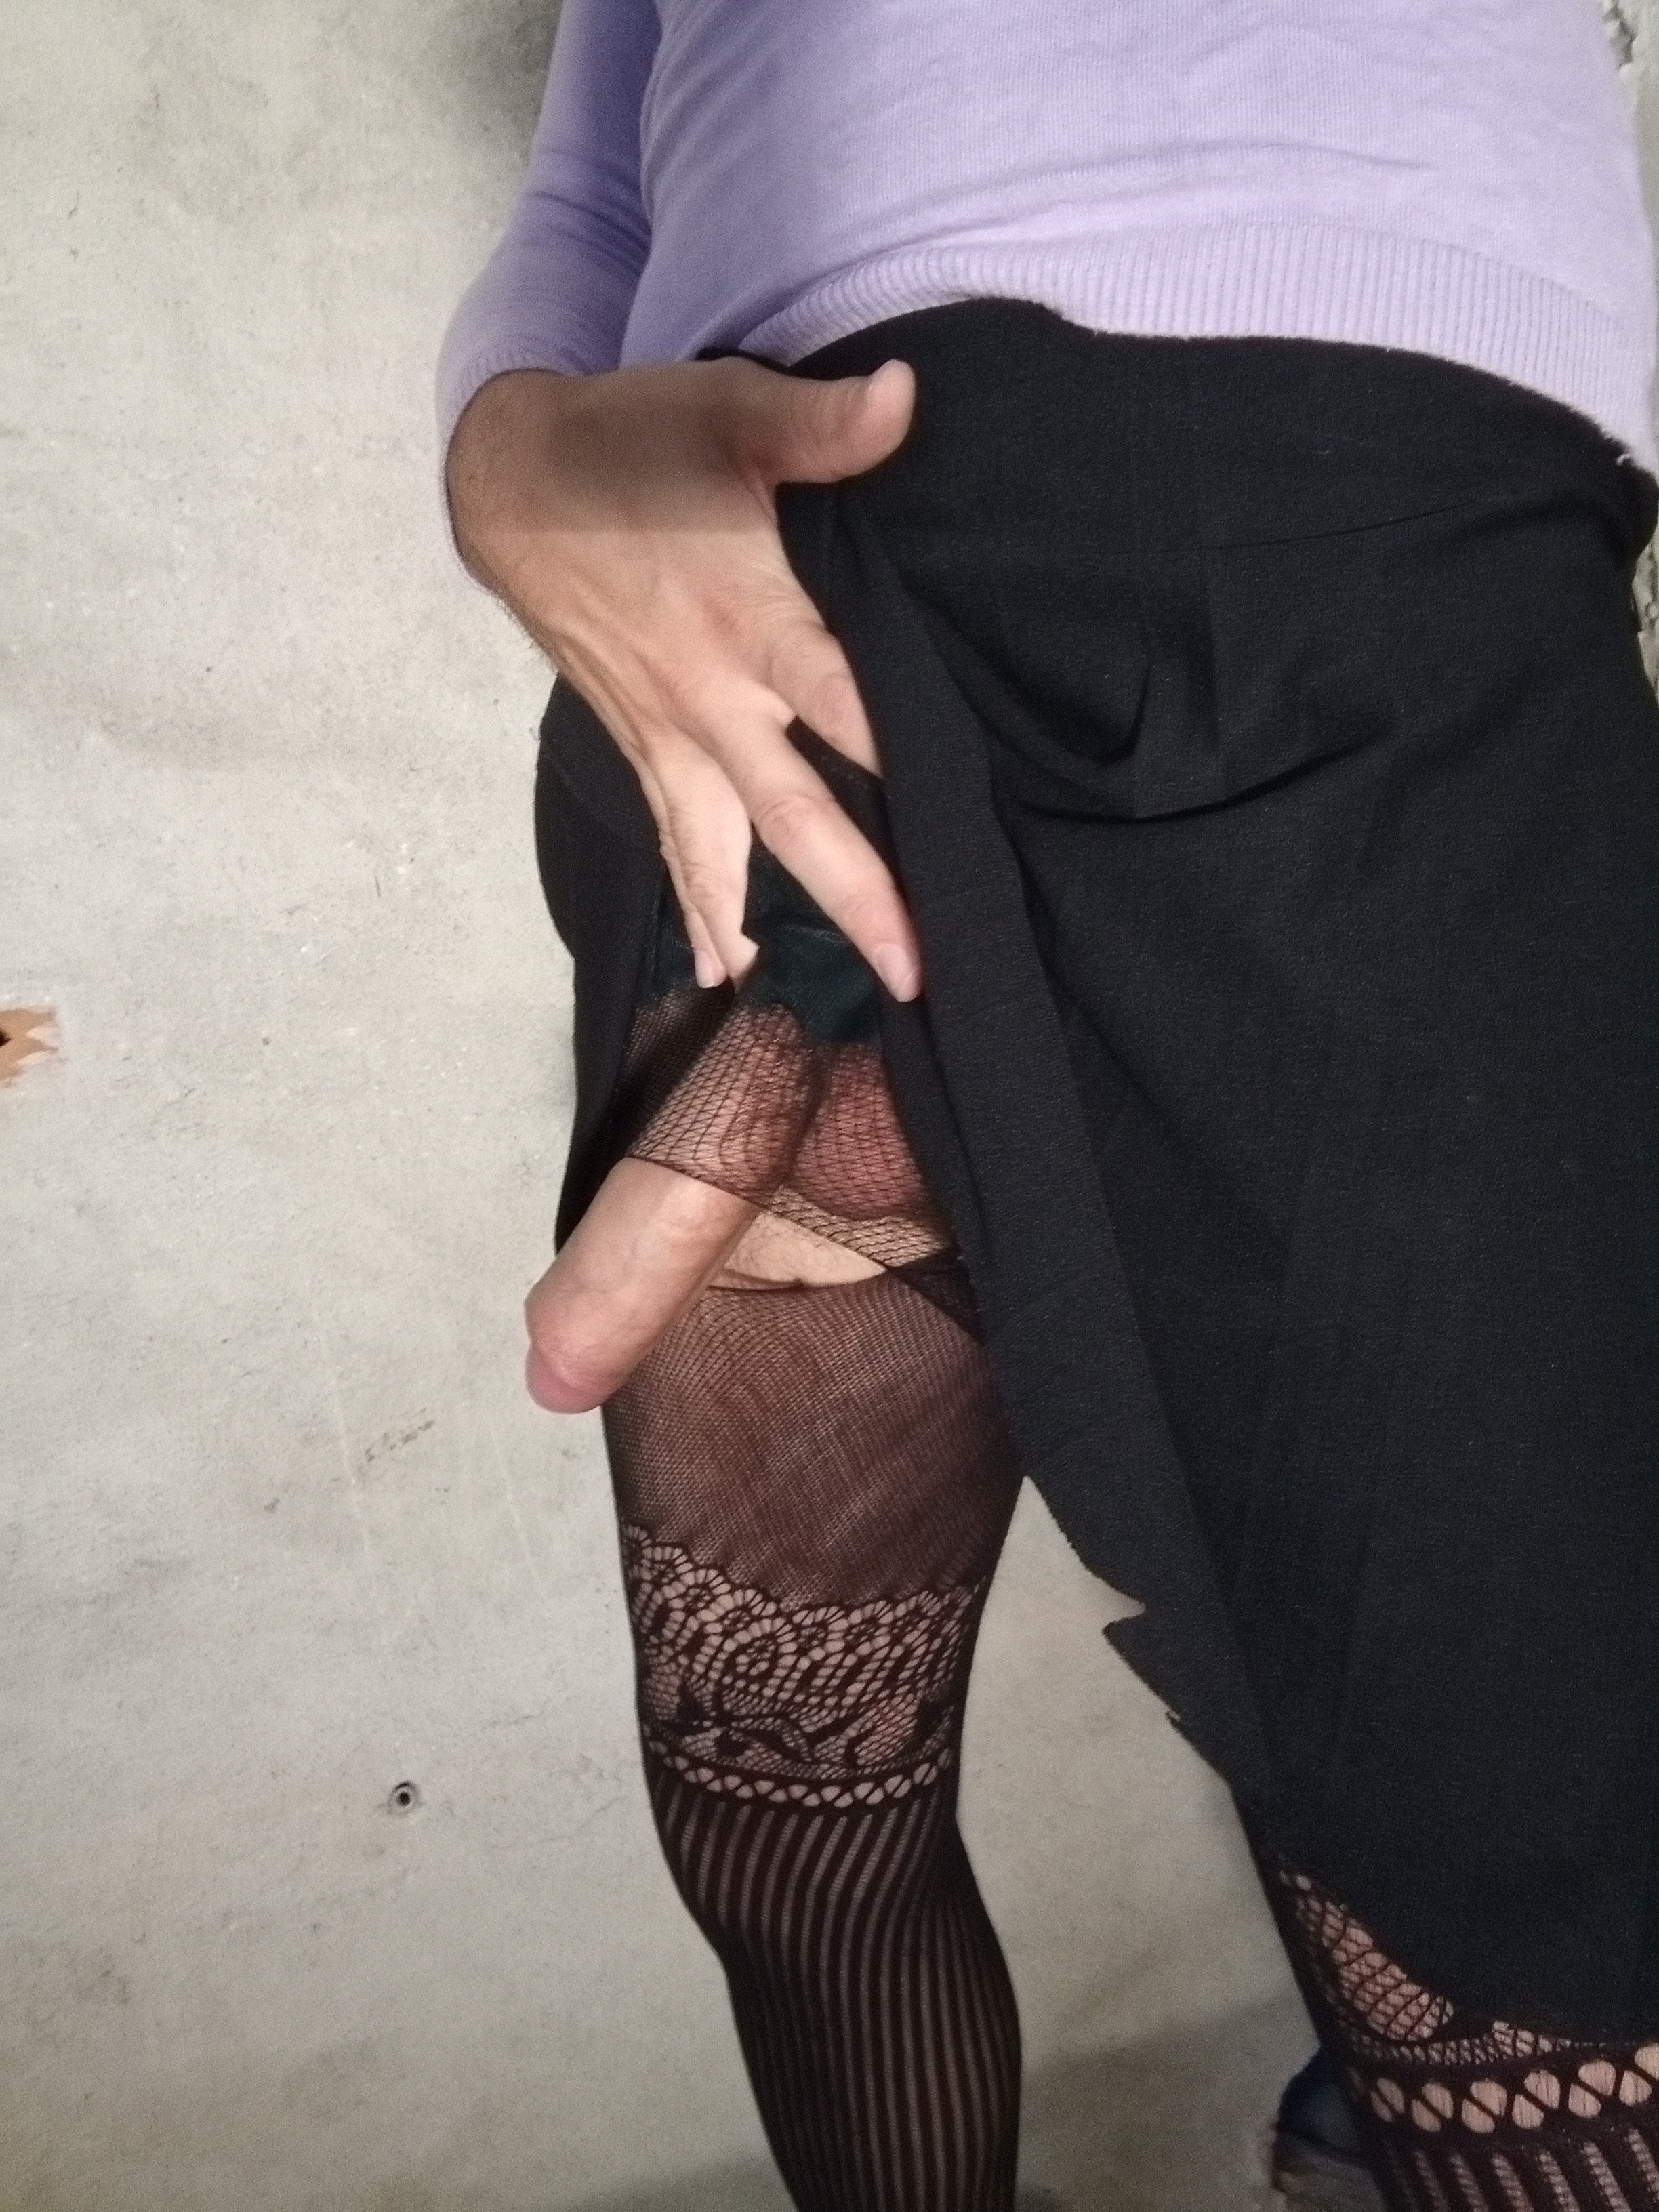 Argentina Crosdresser Porn i'm crossdresser - photo 3 - ashemaletube